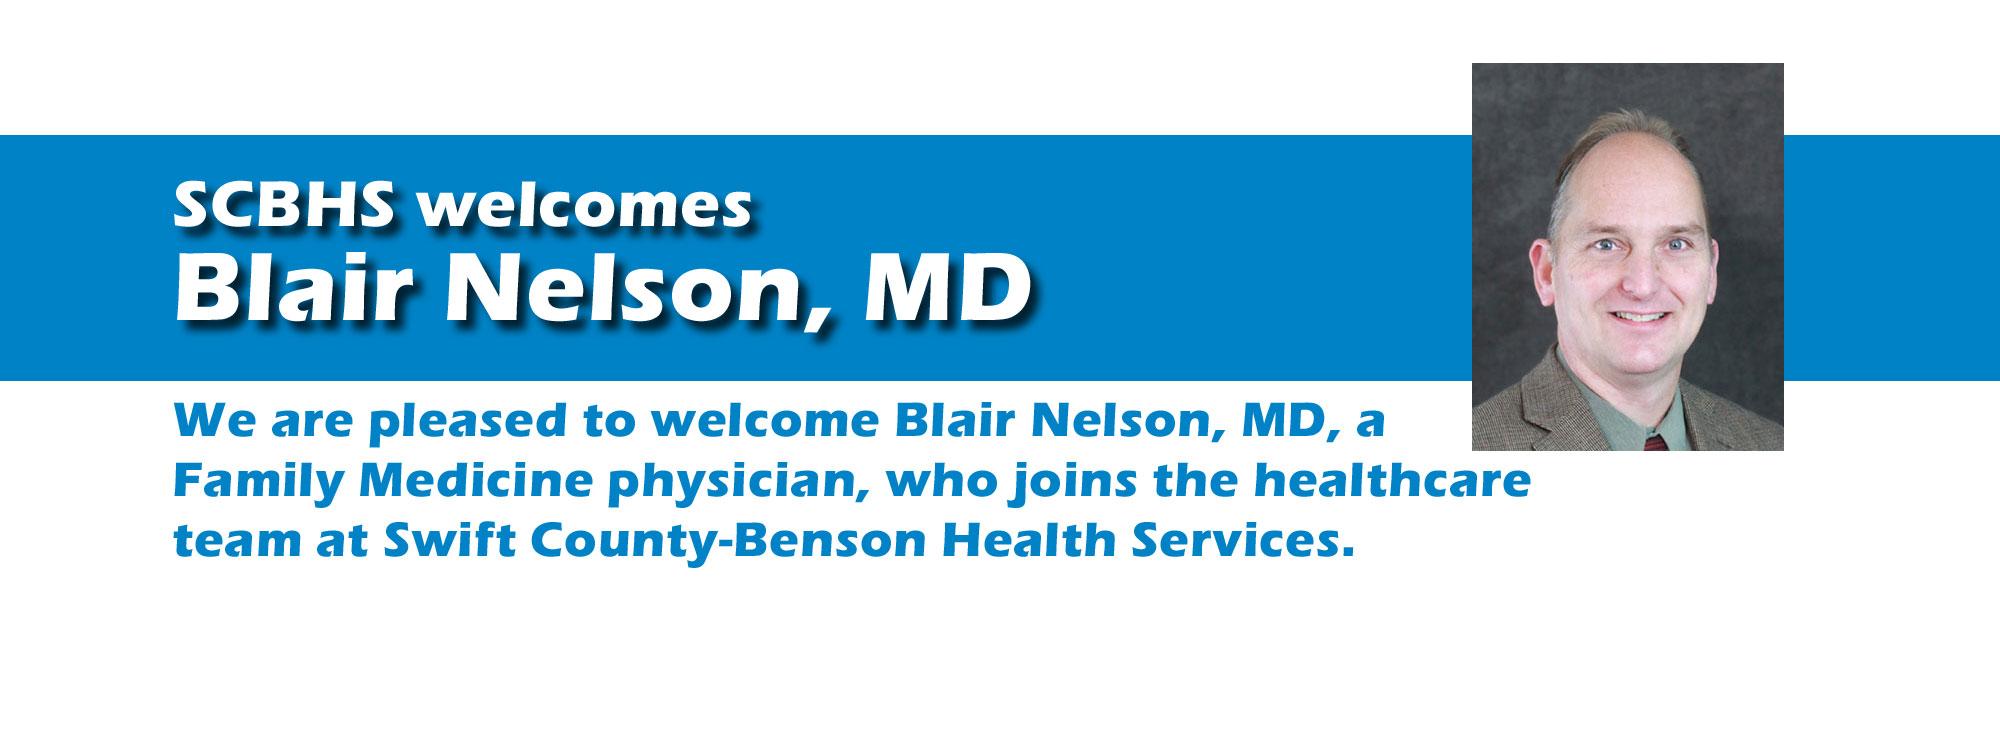 Blair Nelson, MD